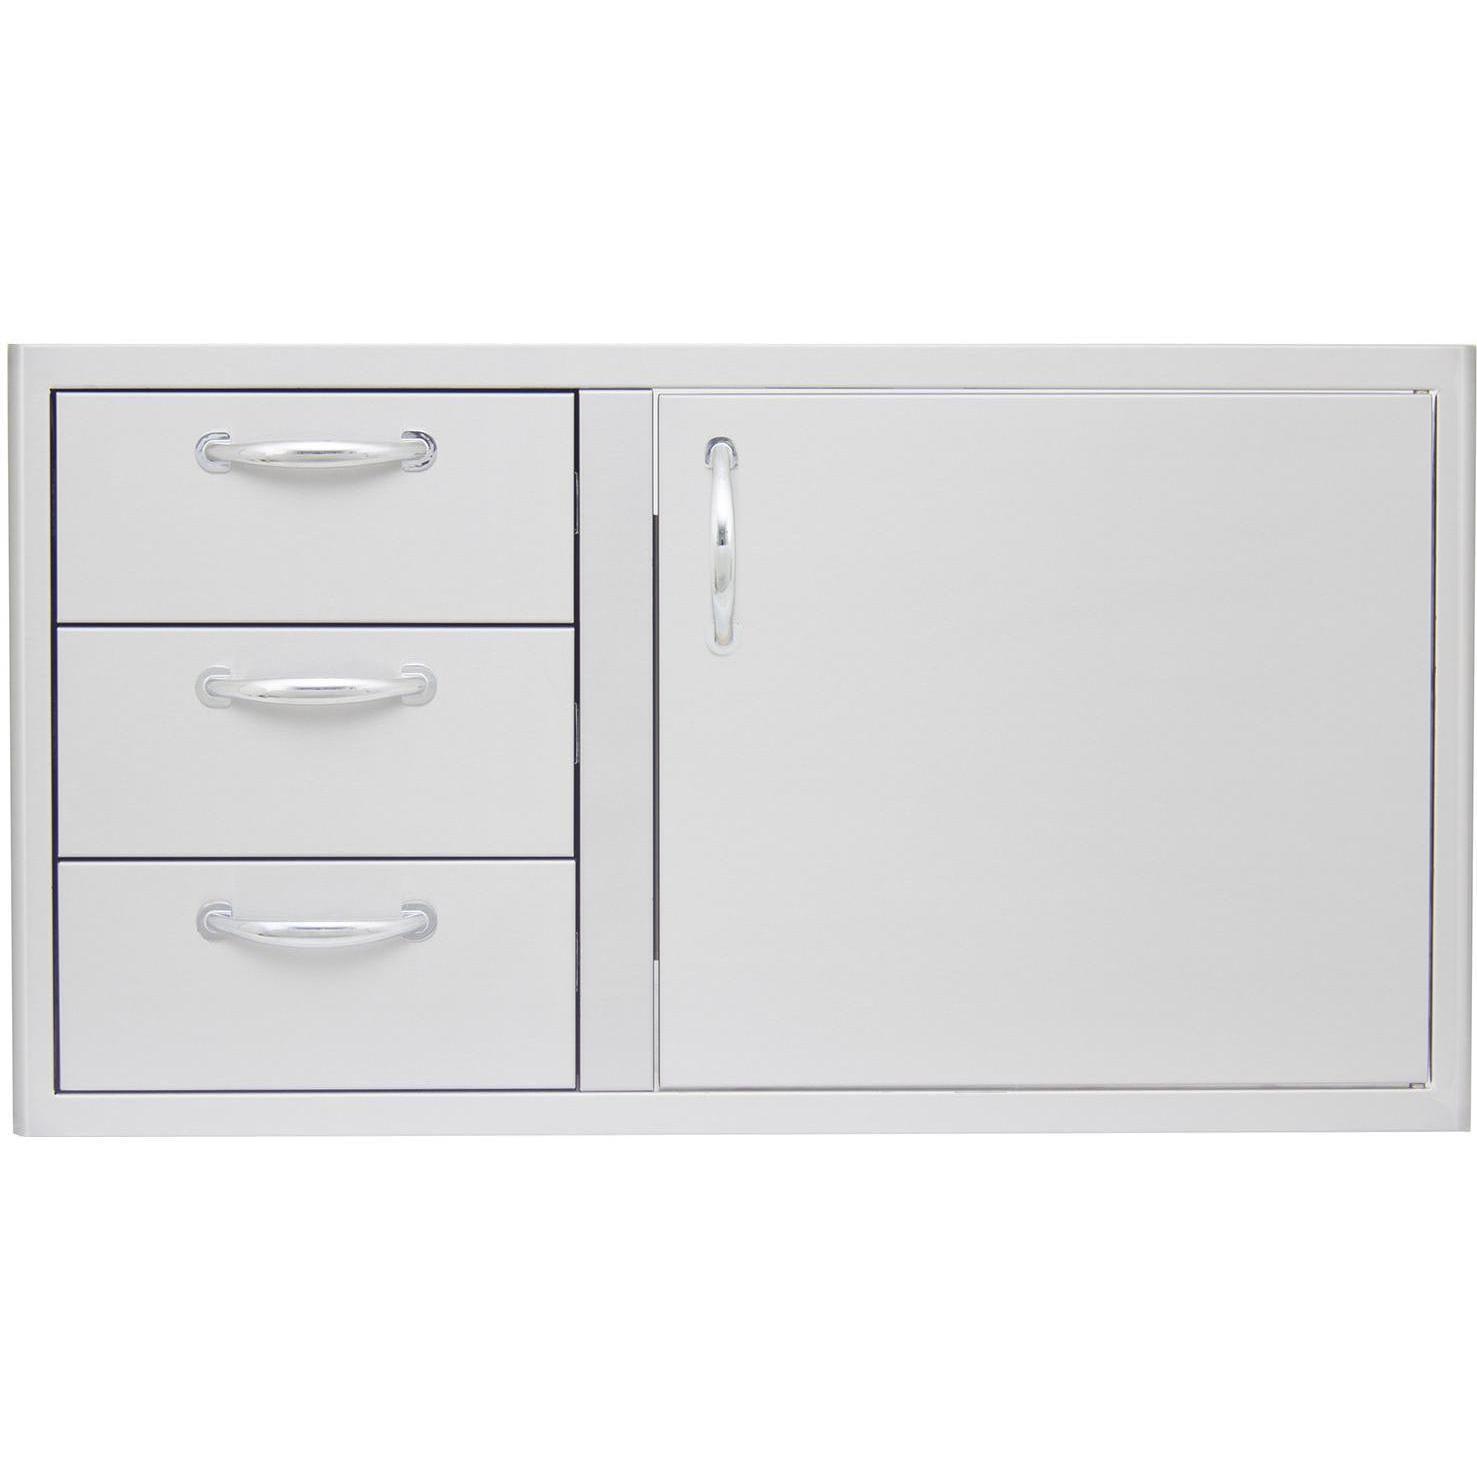 Blaze 39 Inch Stainless Steel Access Door Triple Drawer Combo Blz Ddc 39 R Bbqguys Outdoor Kitchen Design Outdoor Kitchen Outdoor Kitchen Appliances